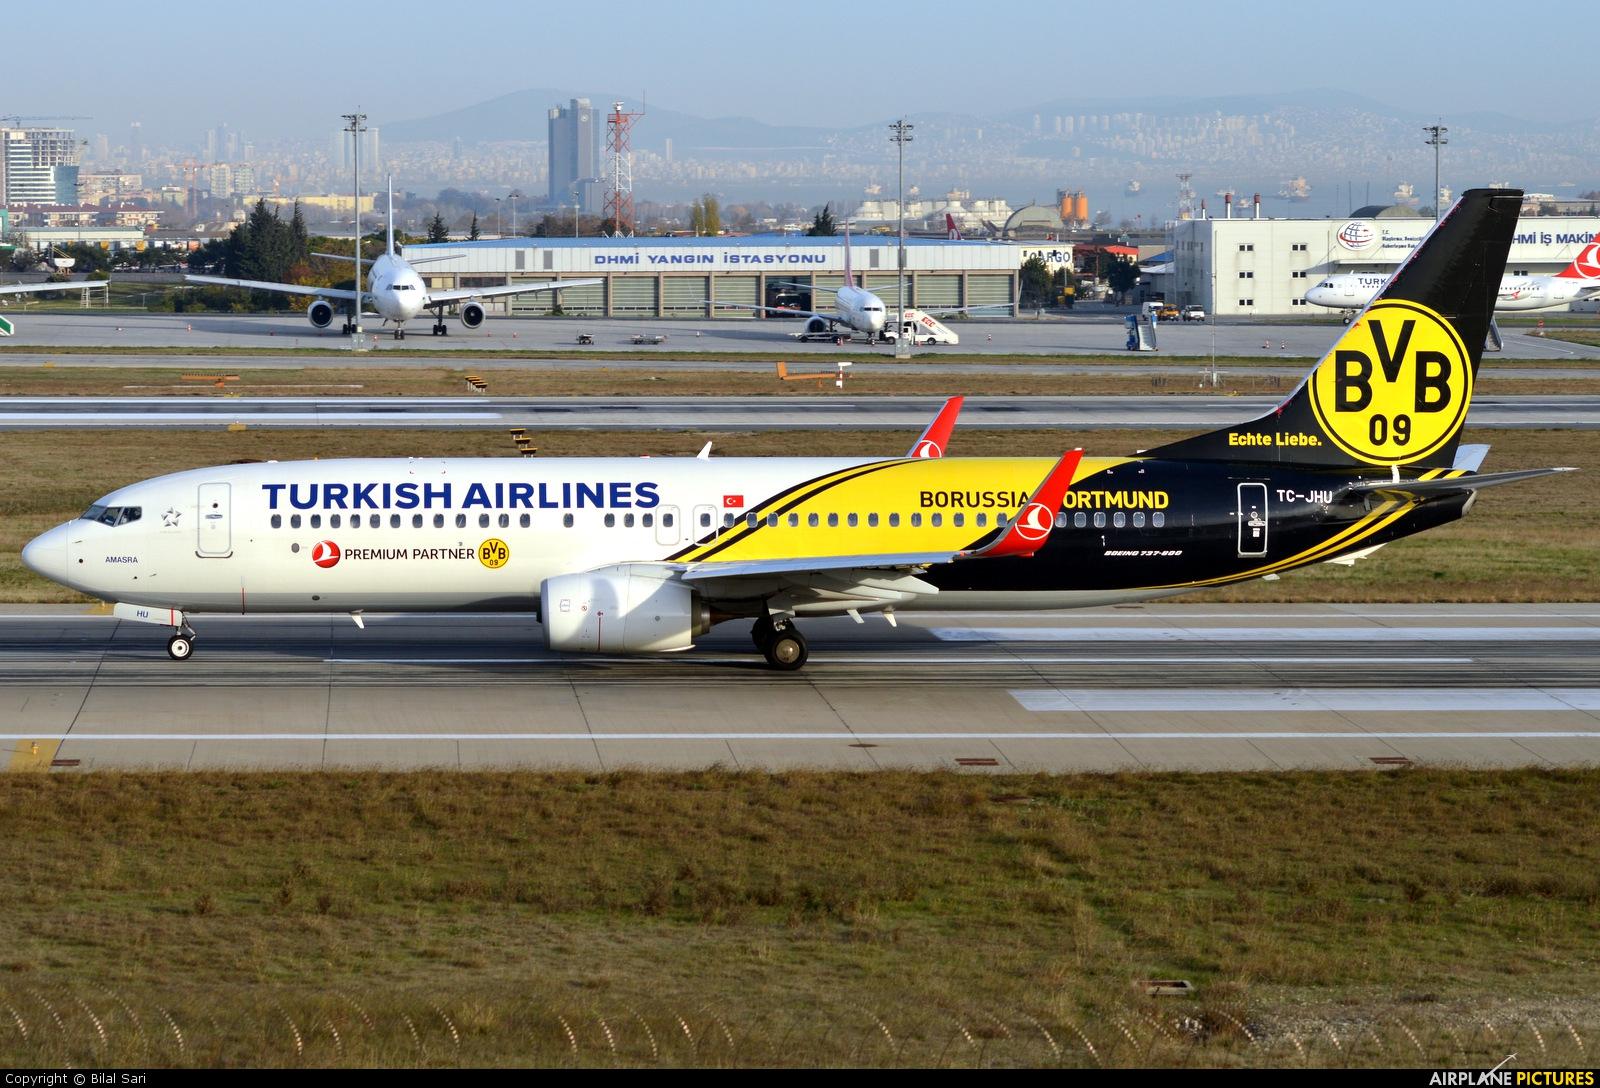 Turkish Airlines TC-JHU aircraft at Istanbul - Ataturk